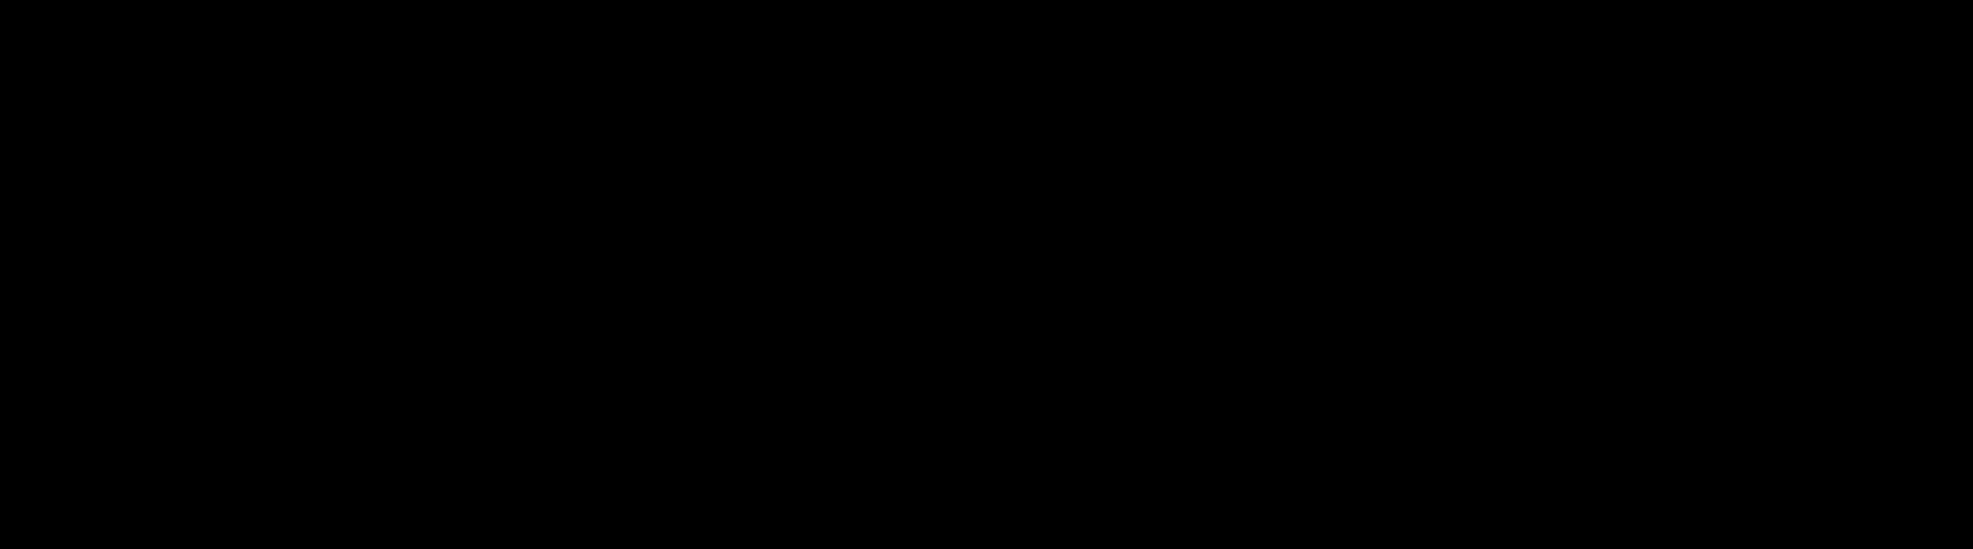 yeezys png - Yeezy Logo Symbol Meaning